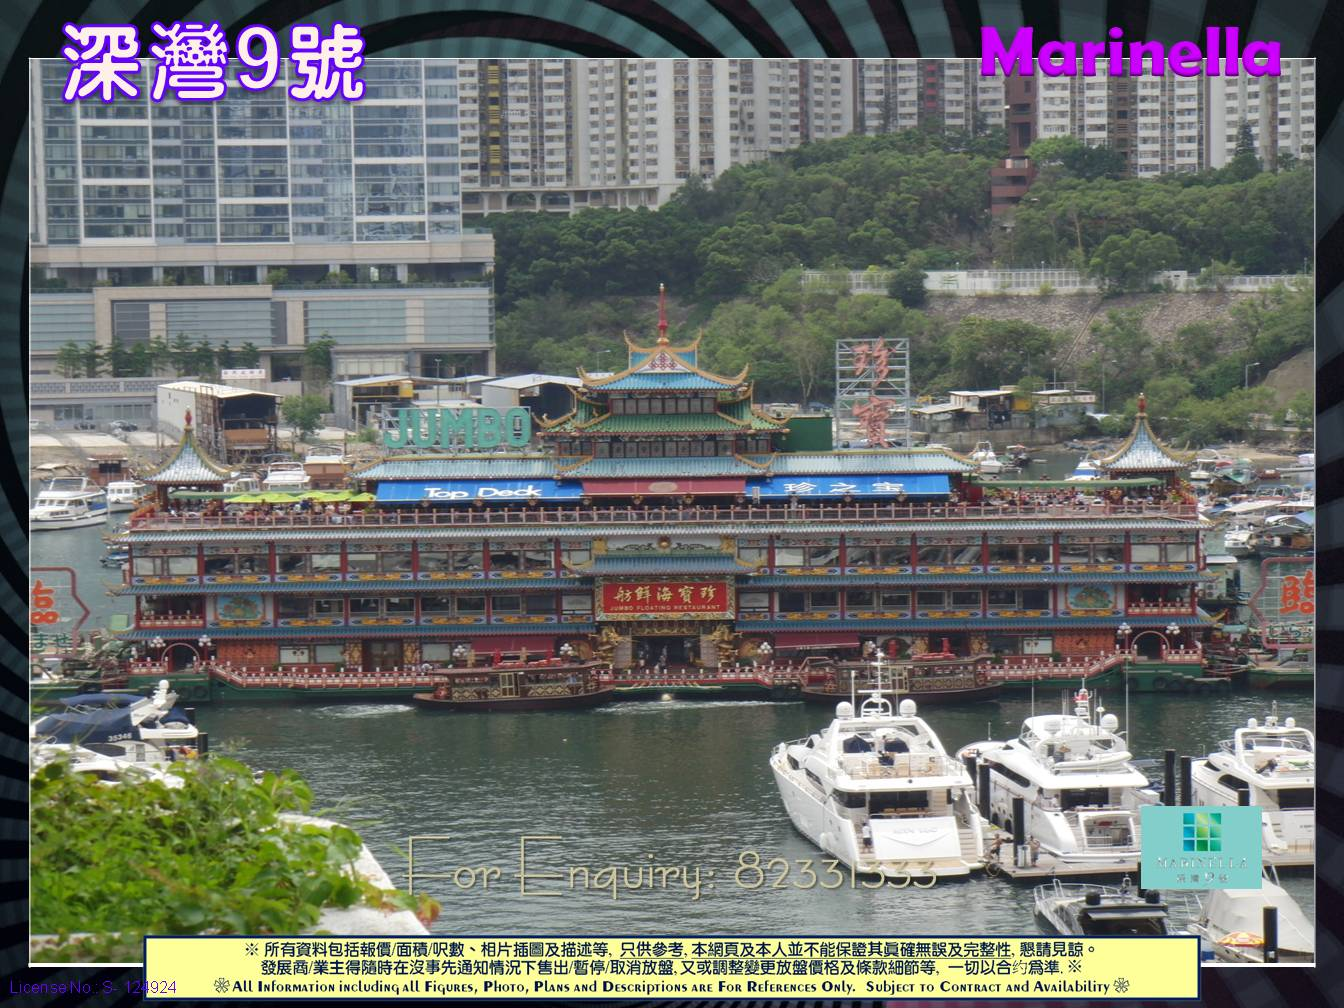 Your's Dream House Consultant - HK Lux. KLN Lux. & Property Investments Blog 香港豪宅地產藏經閣: 深灣9號 香港仔惠福道9號 ...